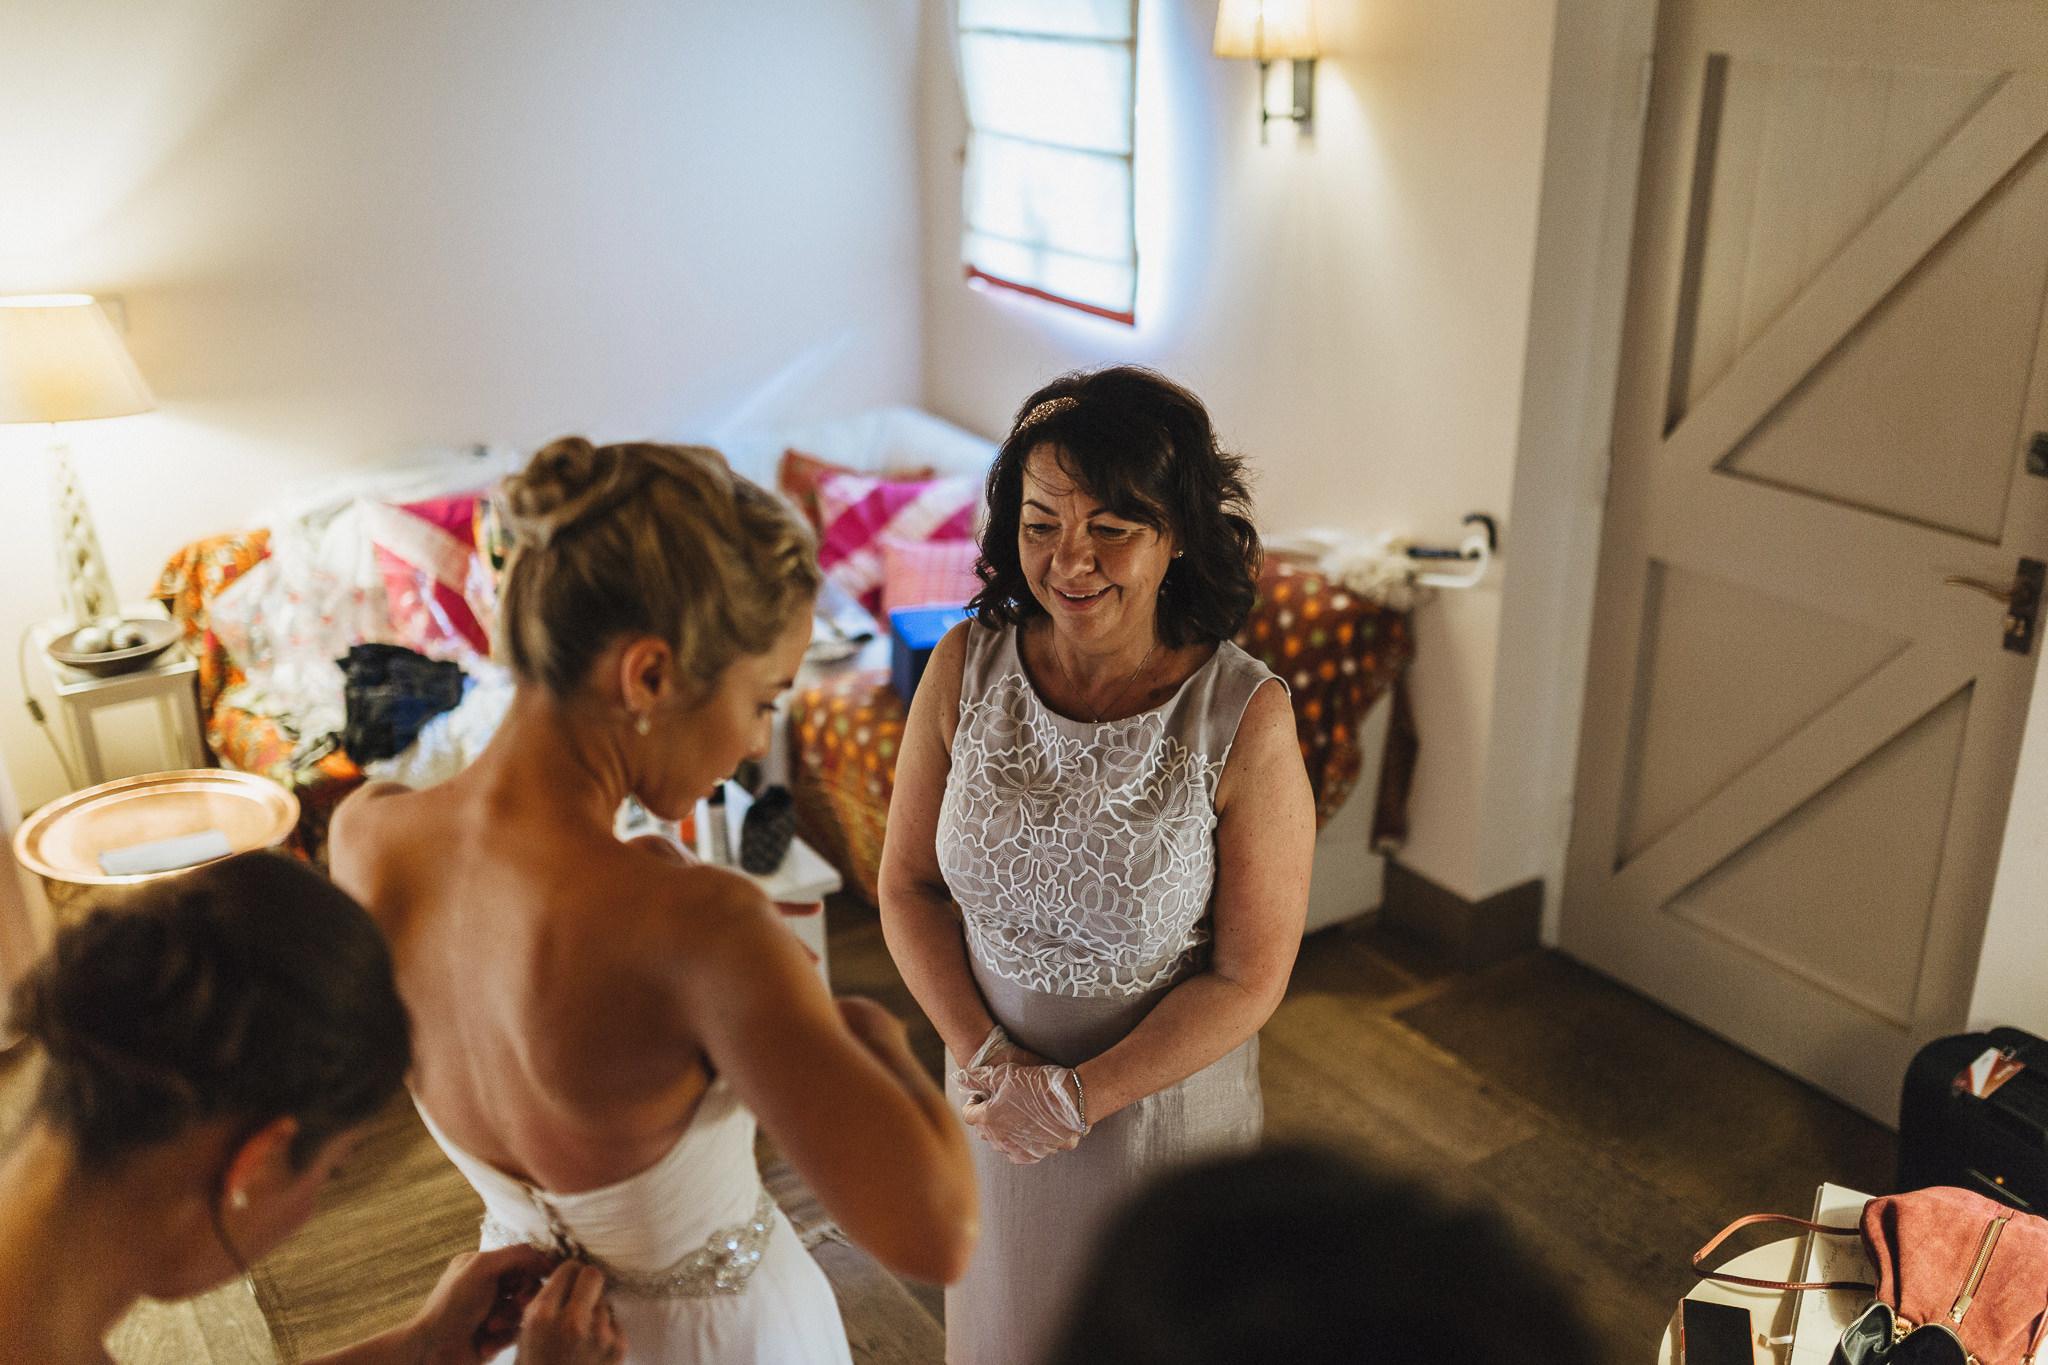 paul-marbrook-Gaynes-Park Wedding-Photographer-90022